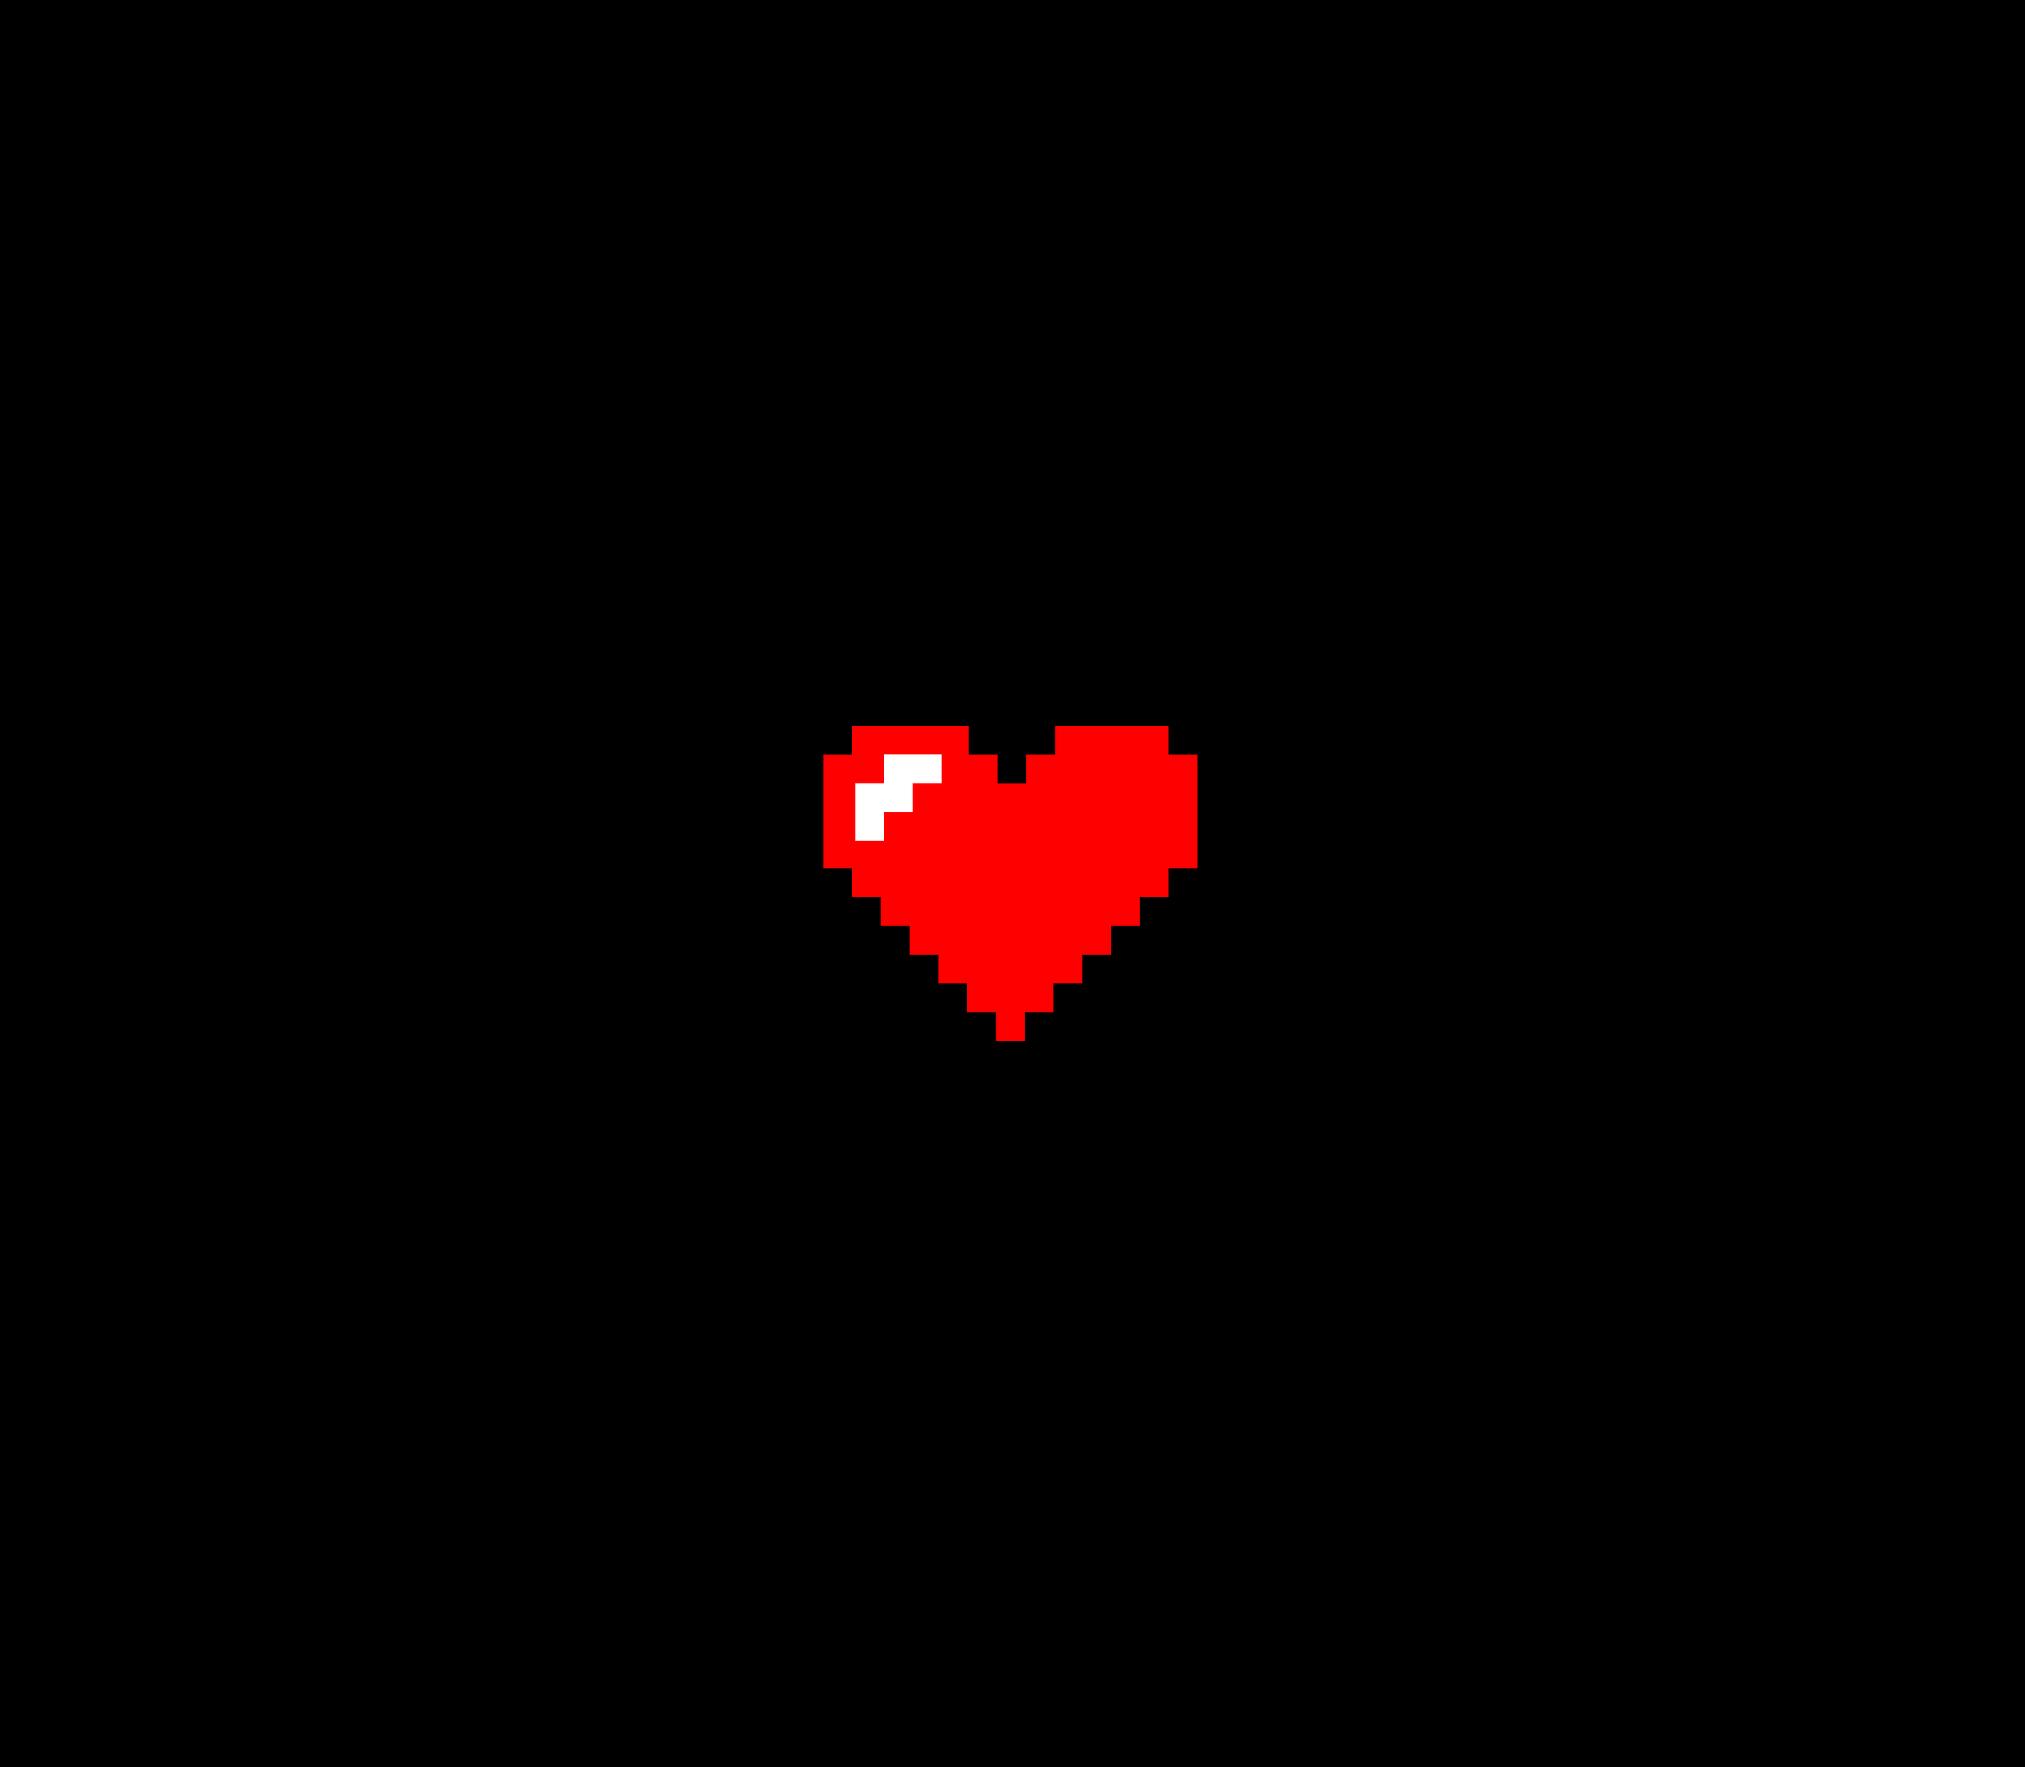 Toptive heart